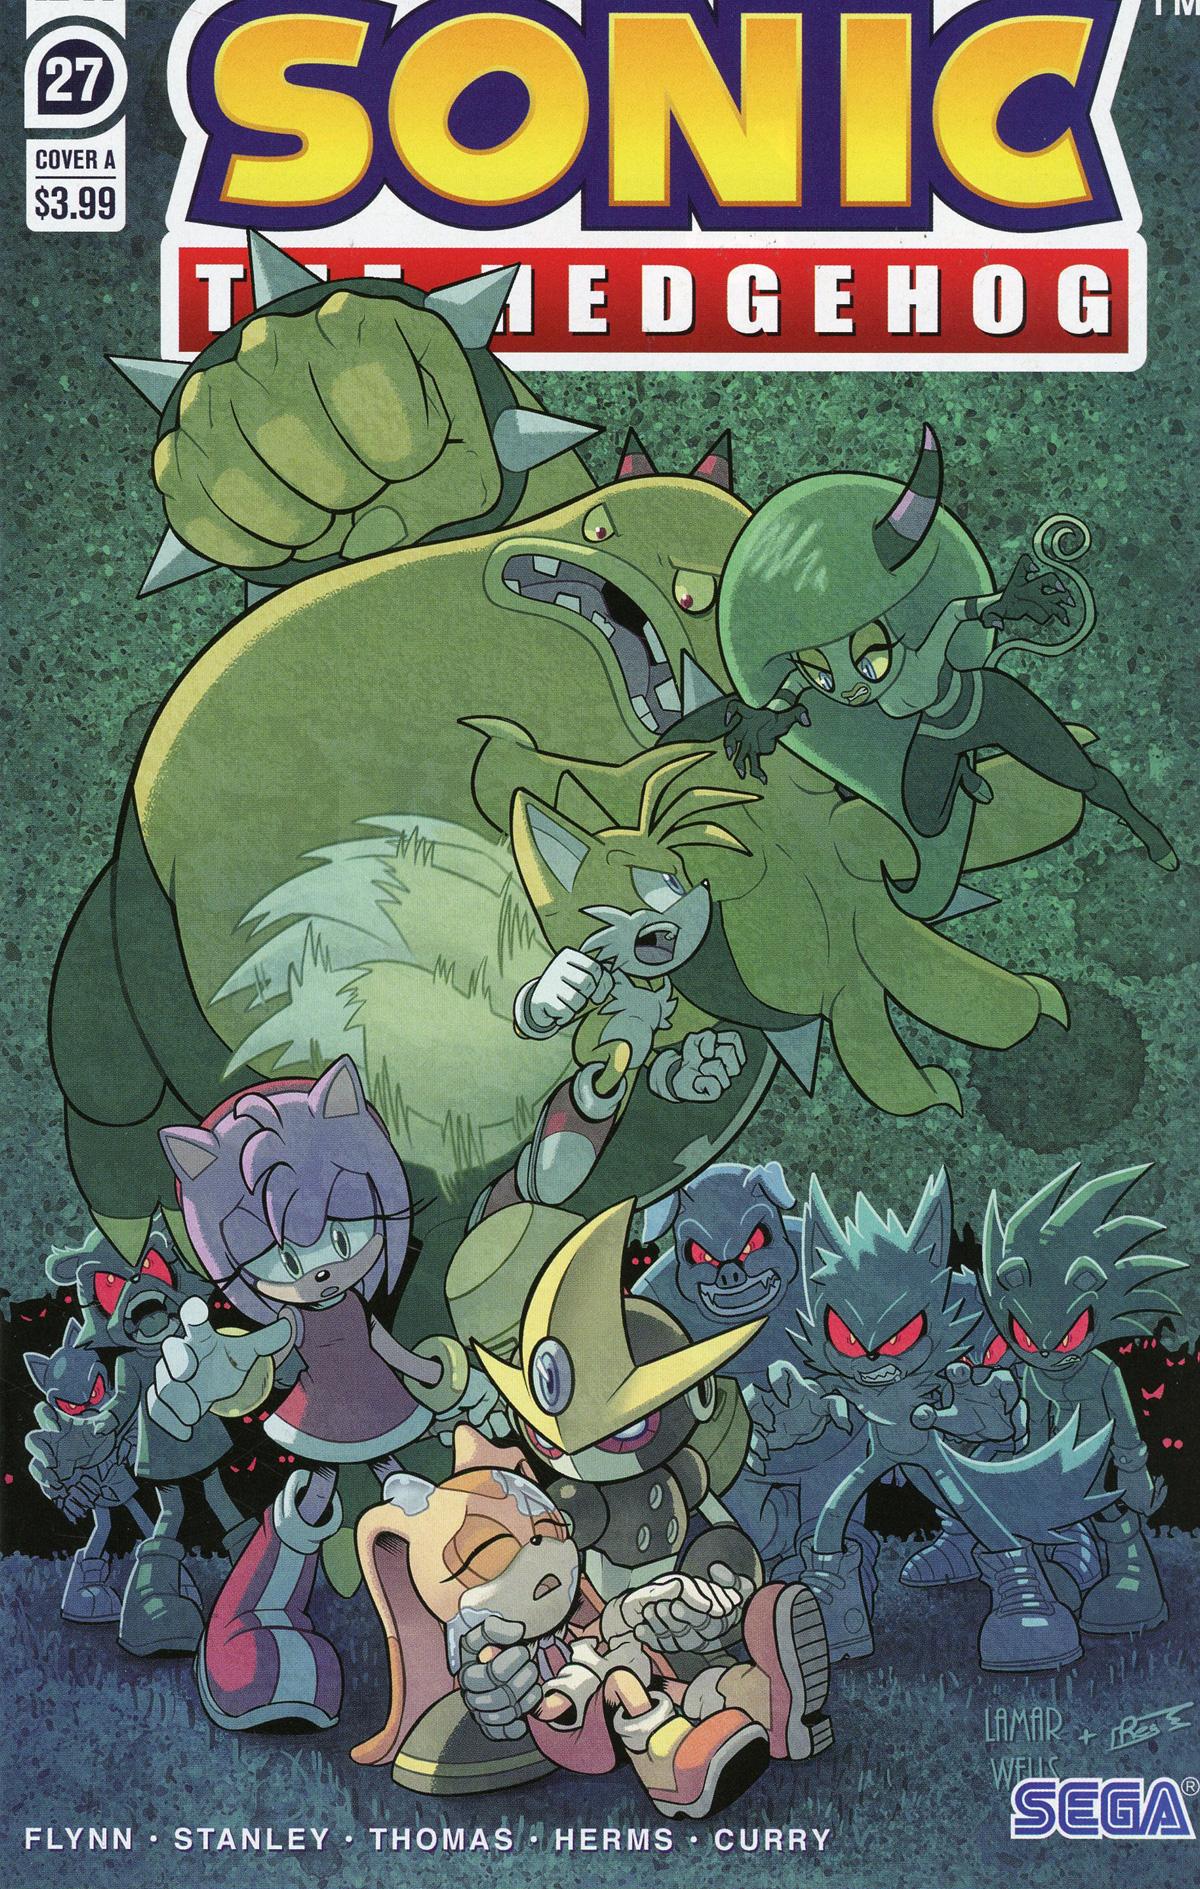 Sonic The Hedgehog Vol 3 #27 Cover A Regular Lamar Wells & Reggie Graham Cover